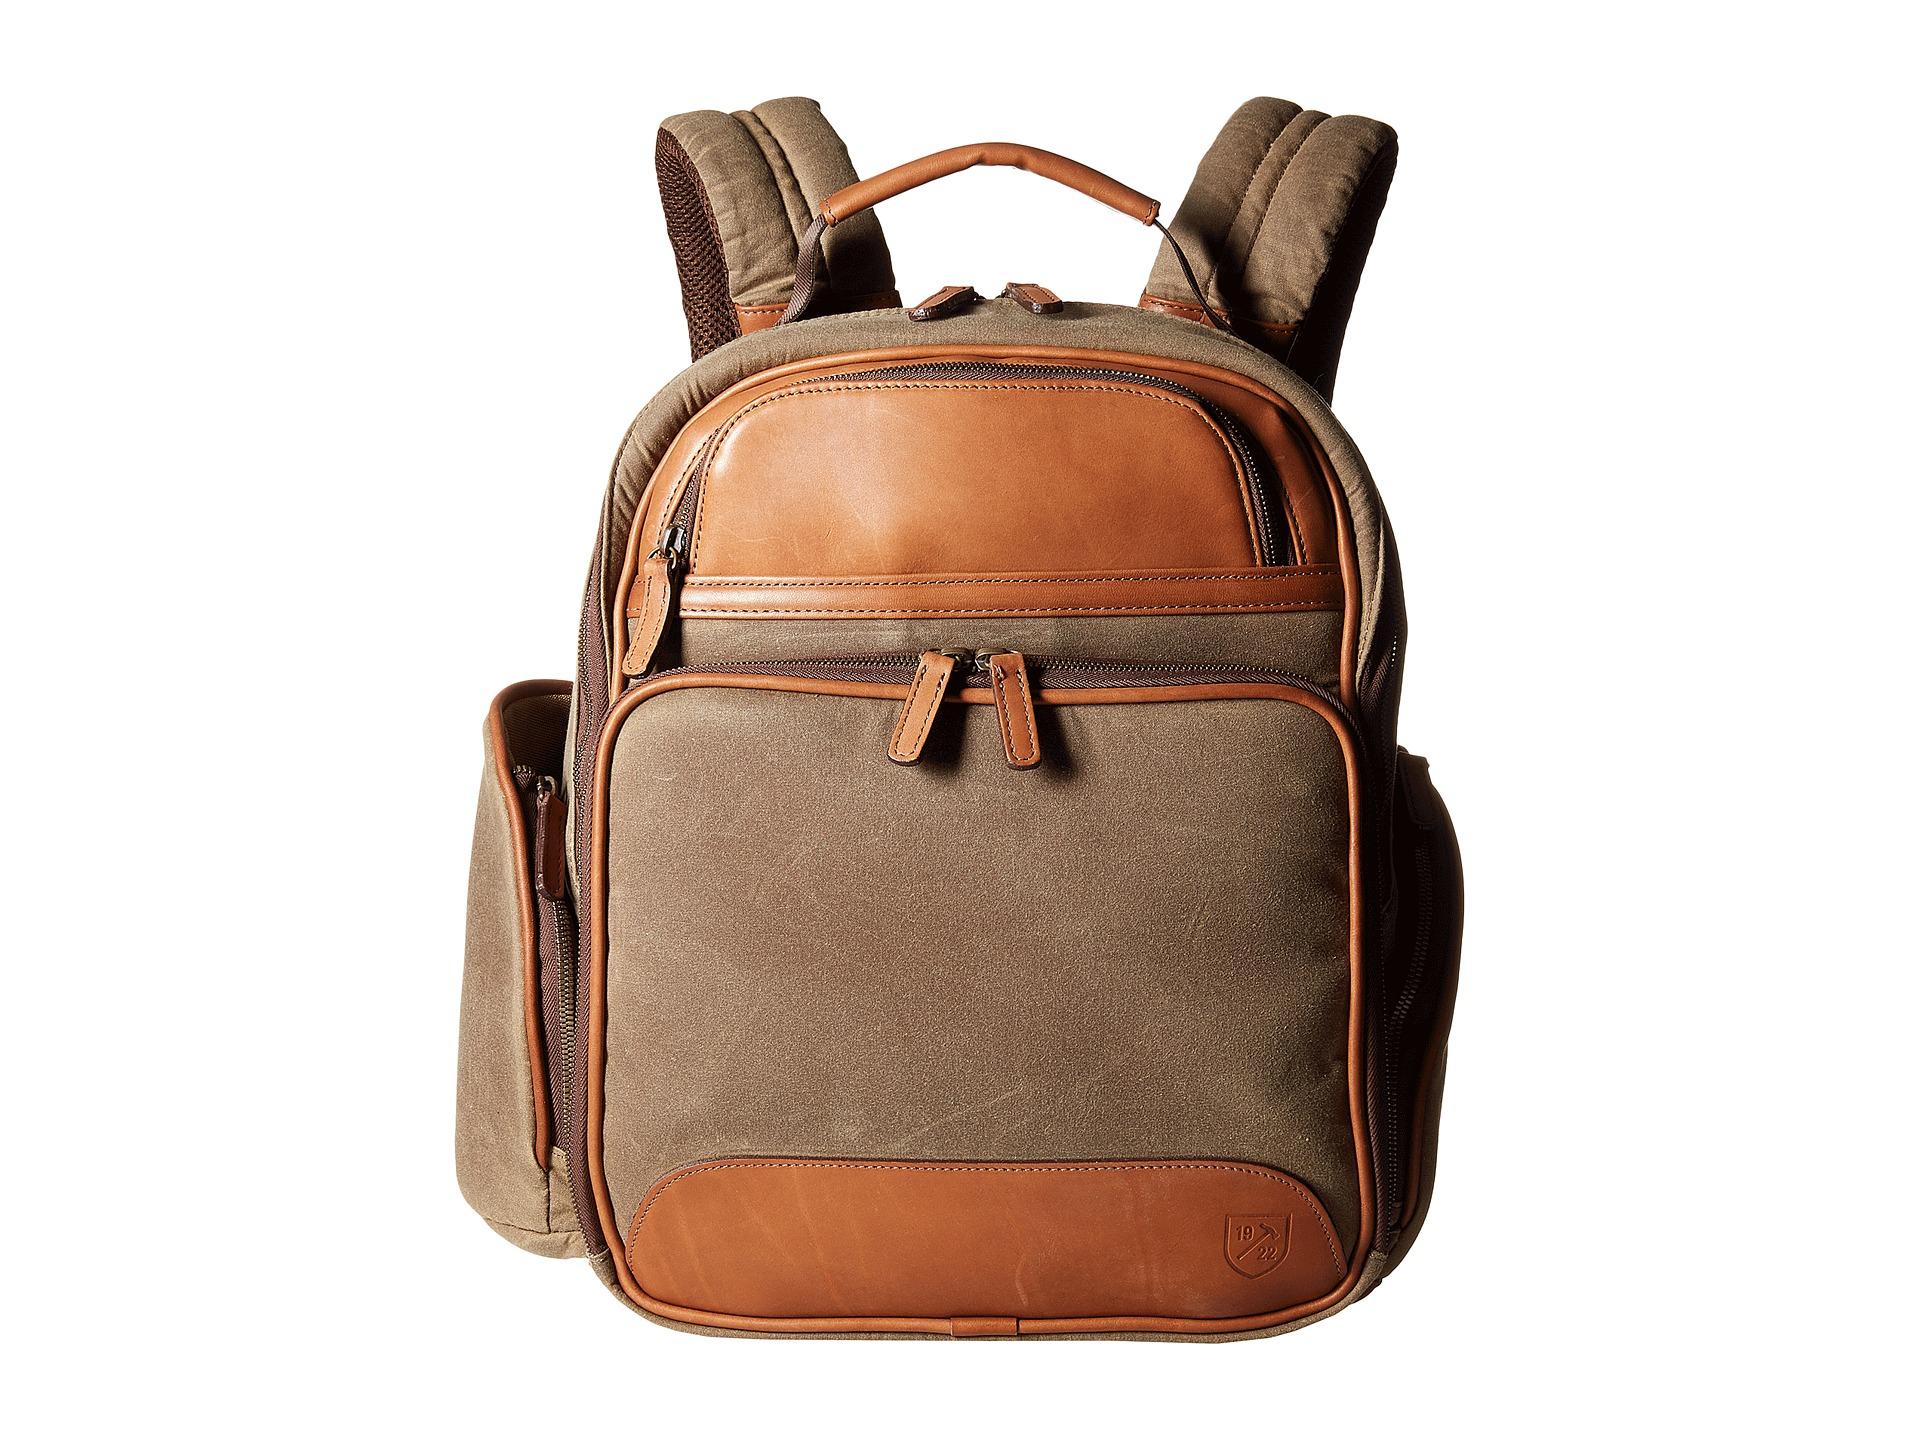 f293f57181 Lyst - Allen Edmonds Canvas leather Backpack in Brown for Men